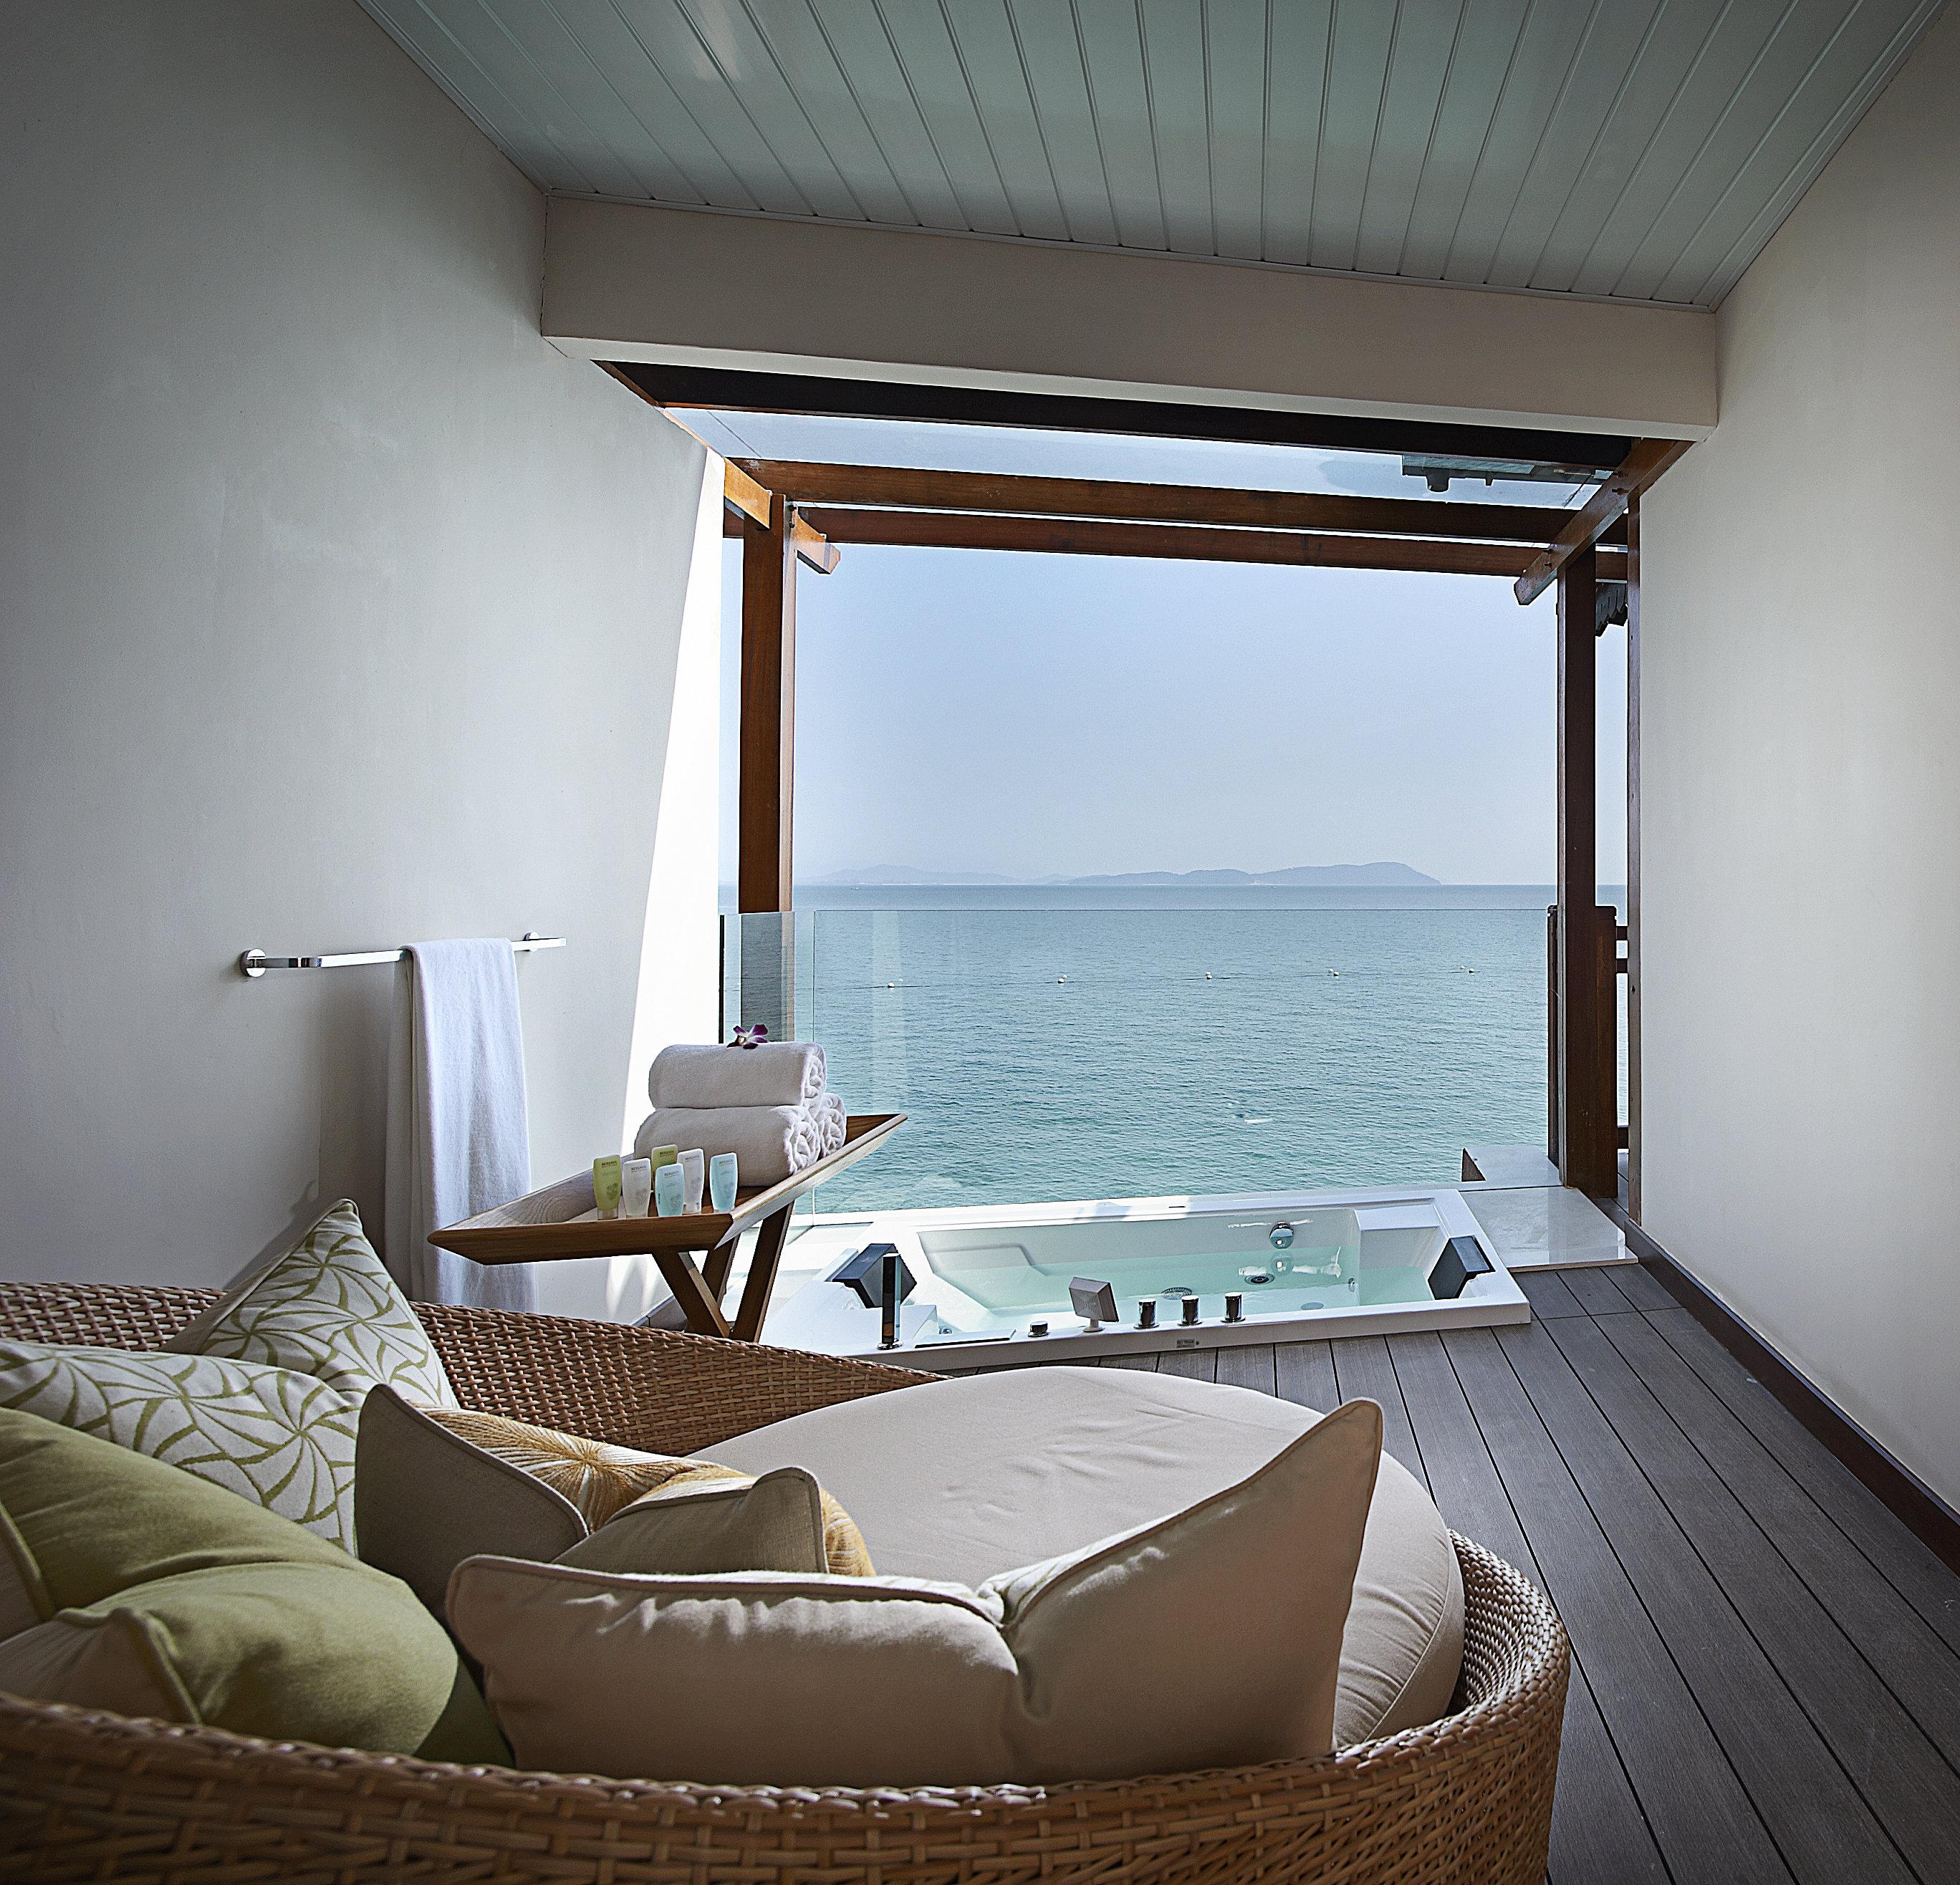 Berjaya-Langkawi-Resort-Premier Suite On Water - Semi Outdoor Lounge & Jacuzzi